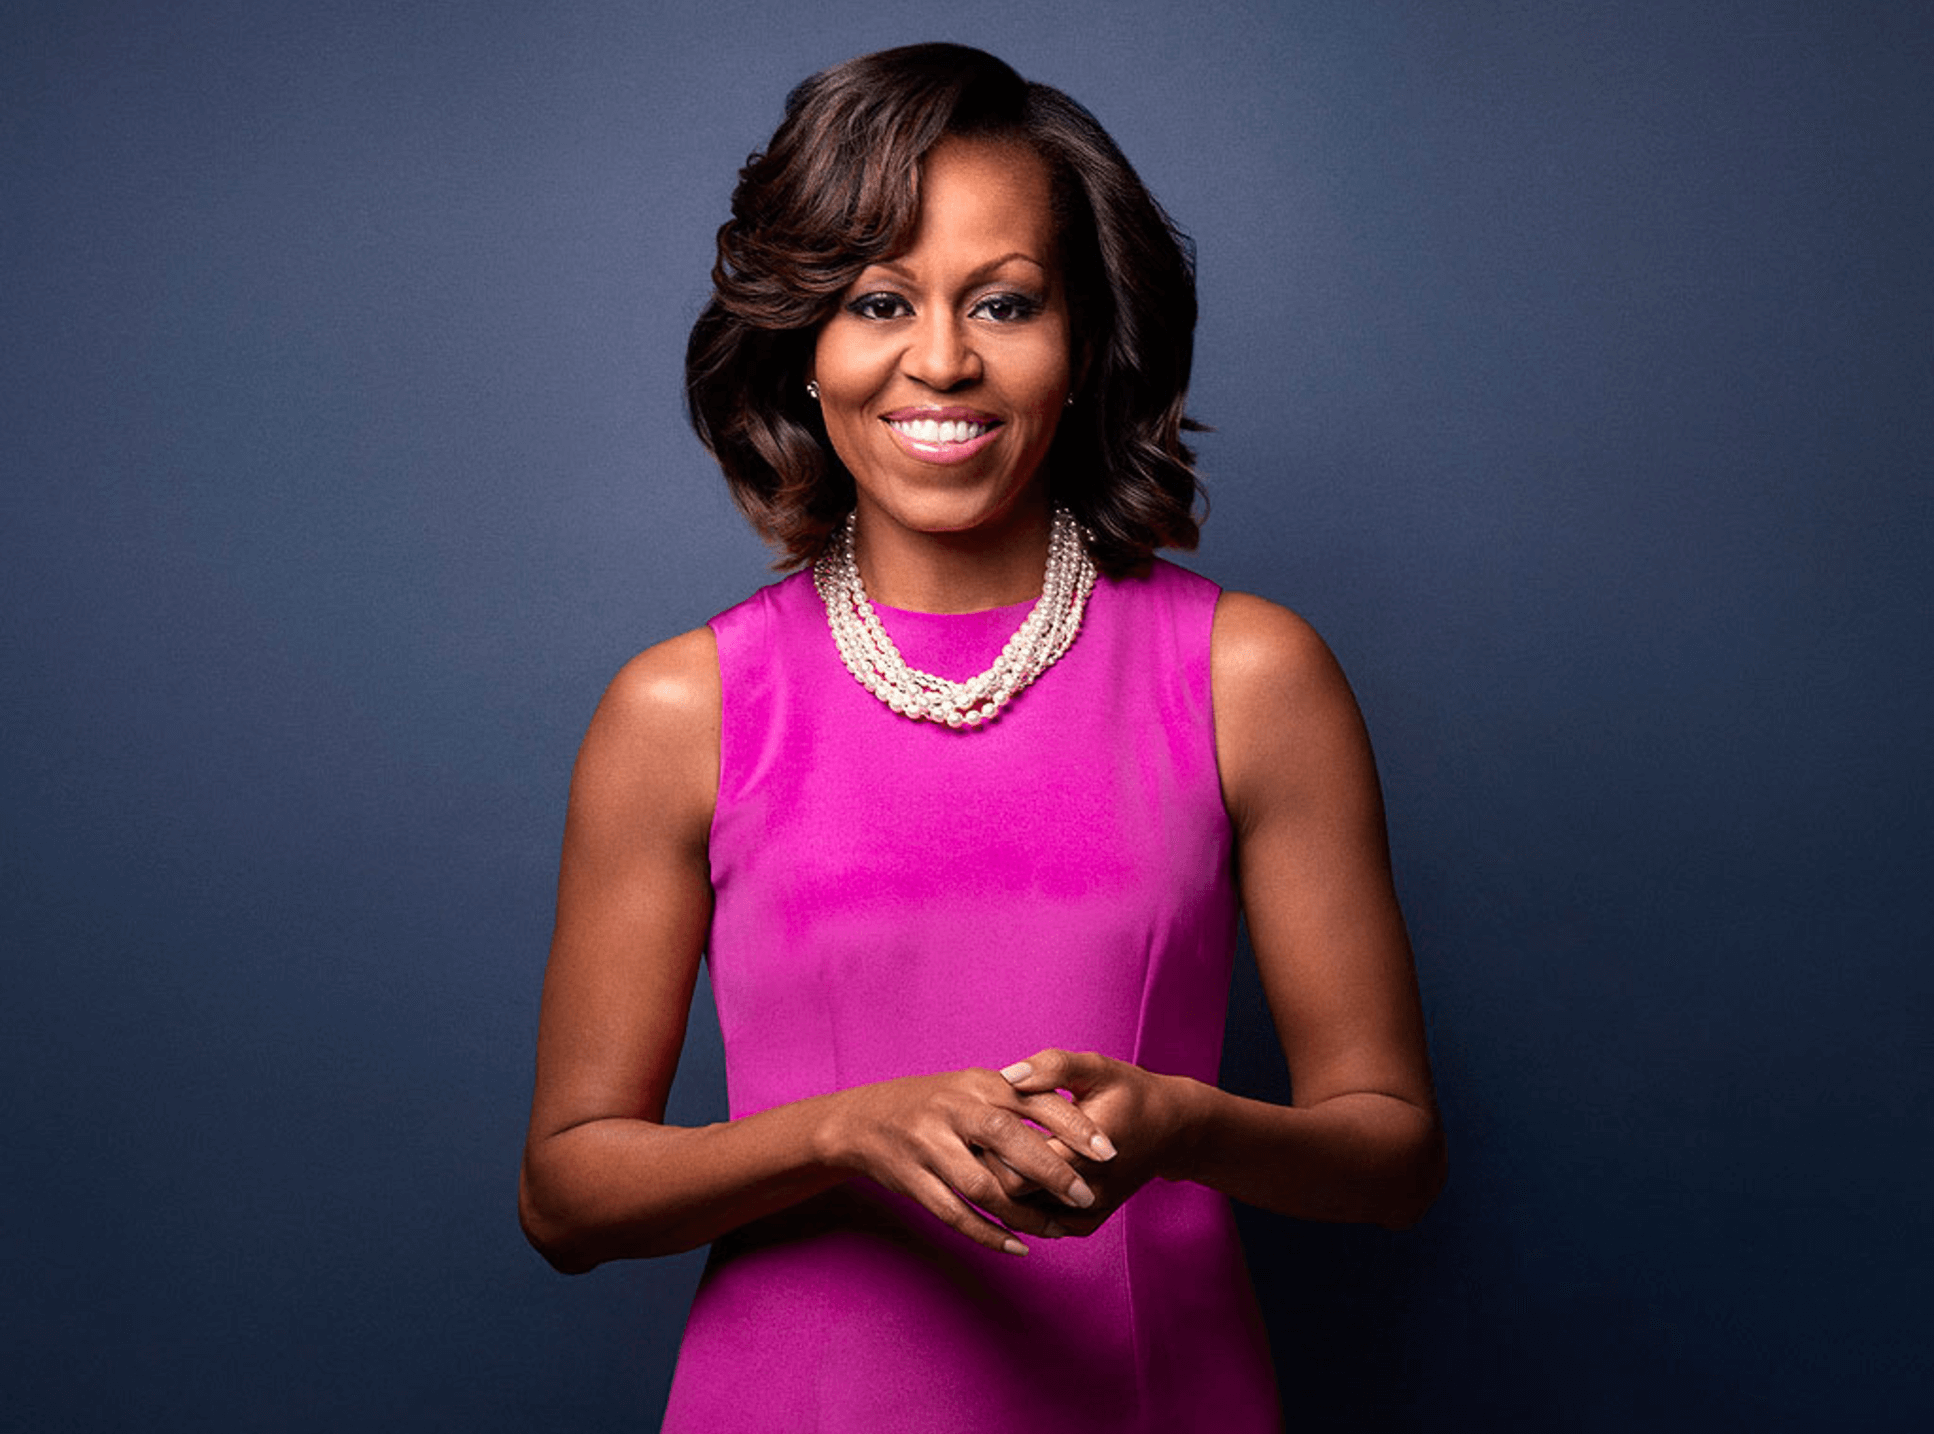 Michelle Obama is a keynote speaker at Hubspot's Inbound 2017 conference